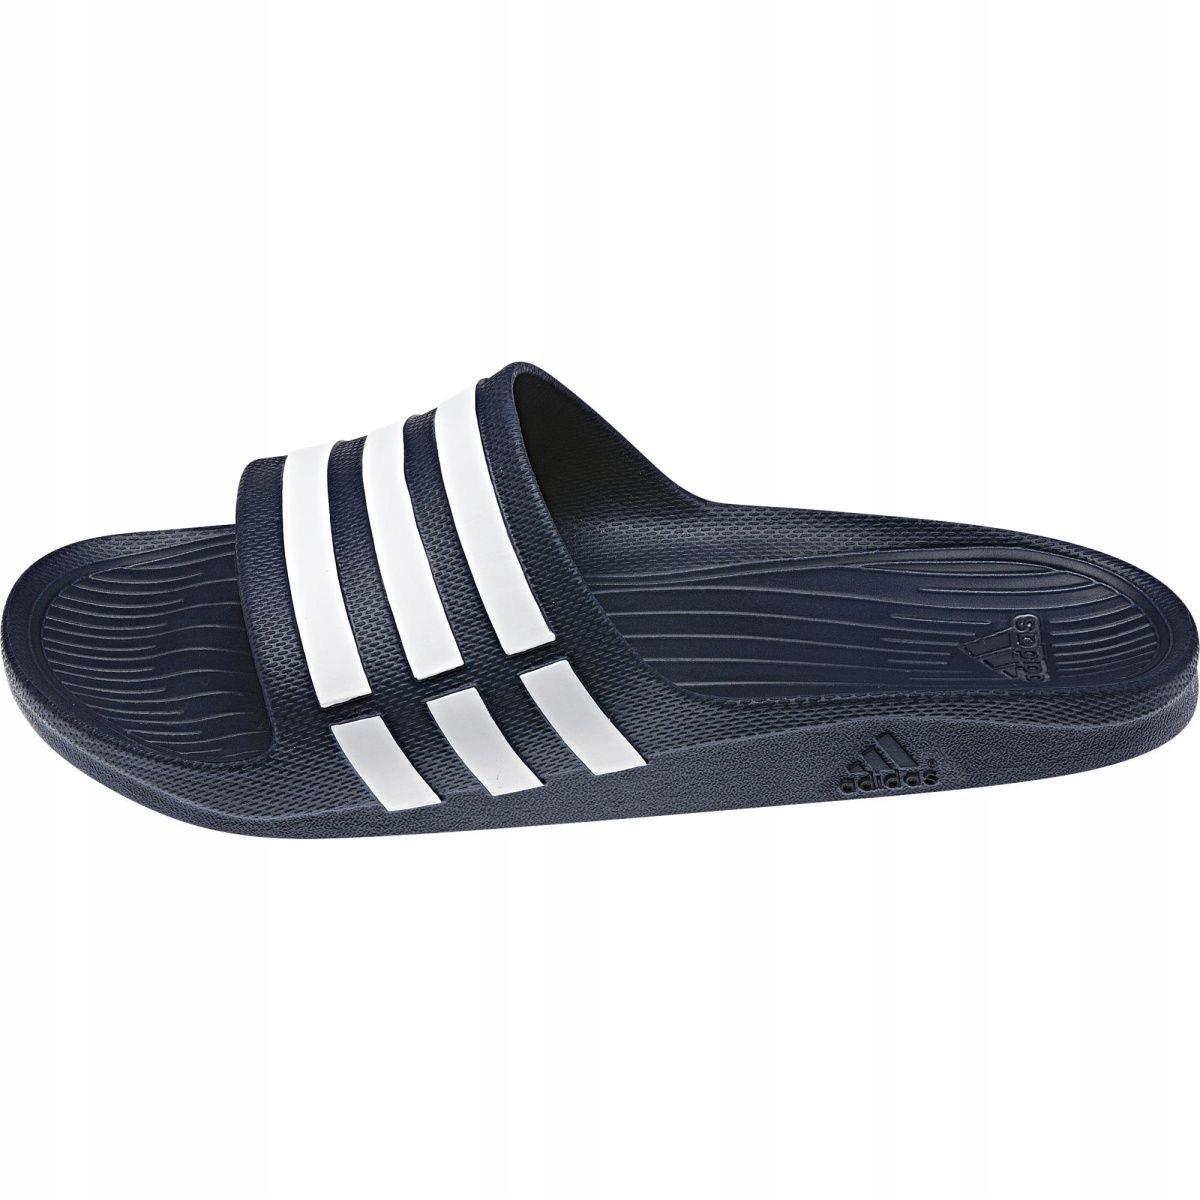 Adidas Duramo Slide G15892 slippers